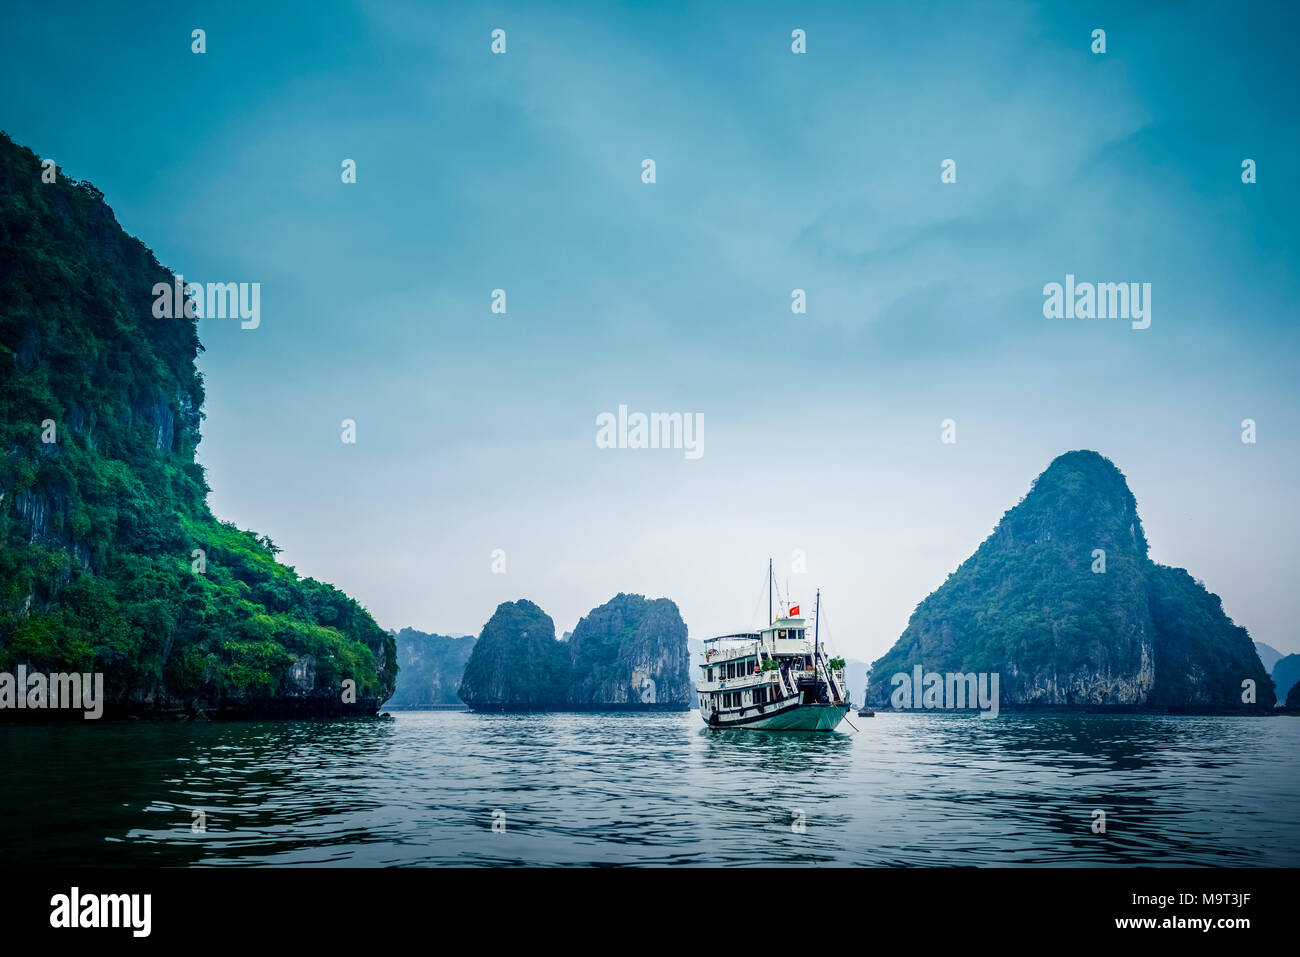 Asien, Vietnam, Quang Ninh Provinz, Halong-Bucht - Stock Image